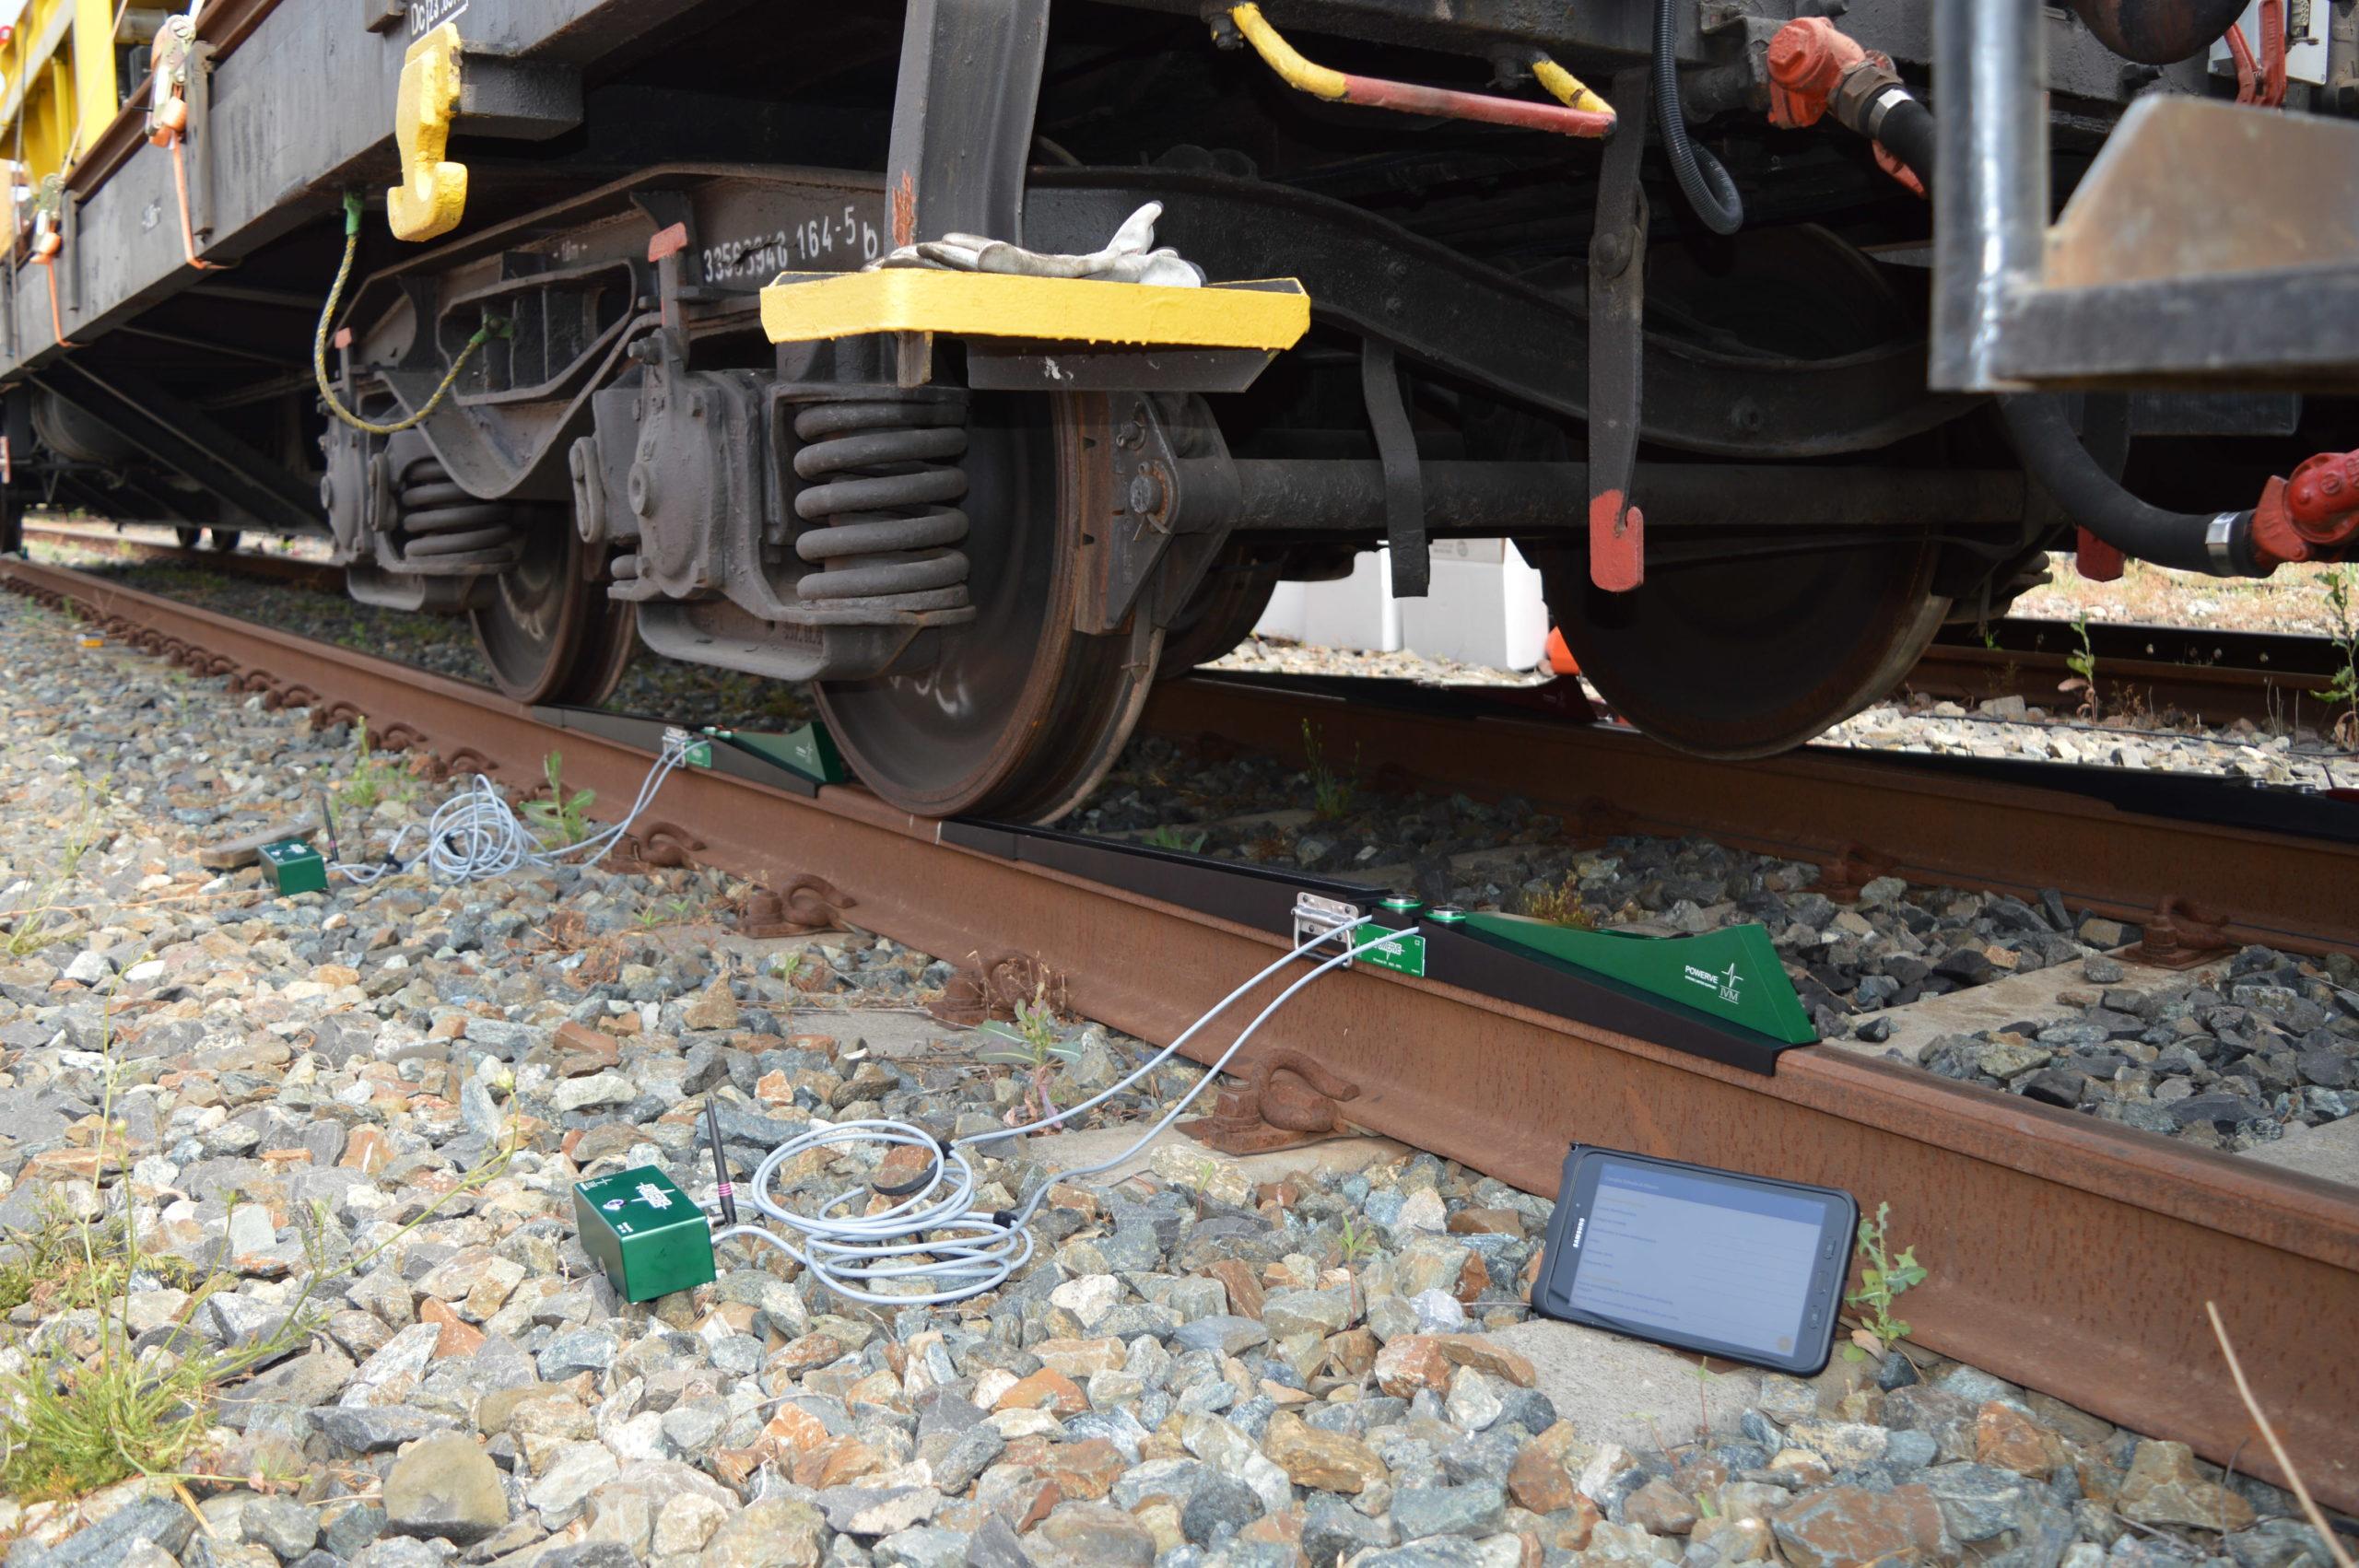 Training per la pesa rotabili da GCF – Generale Costruzioni ferroviarie